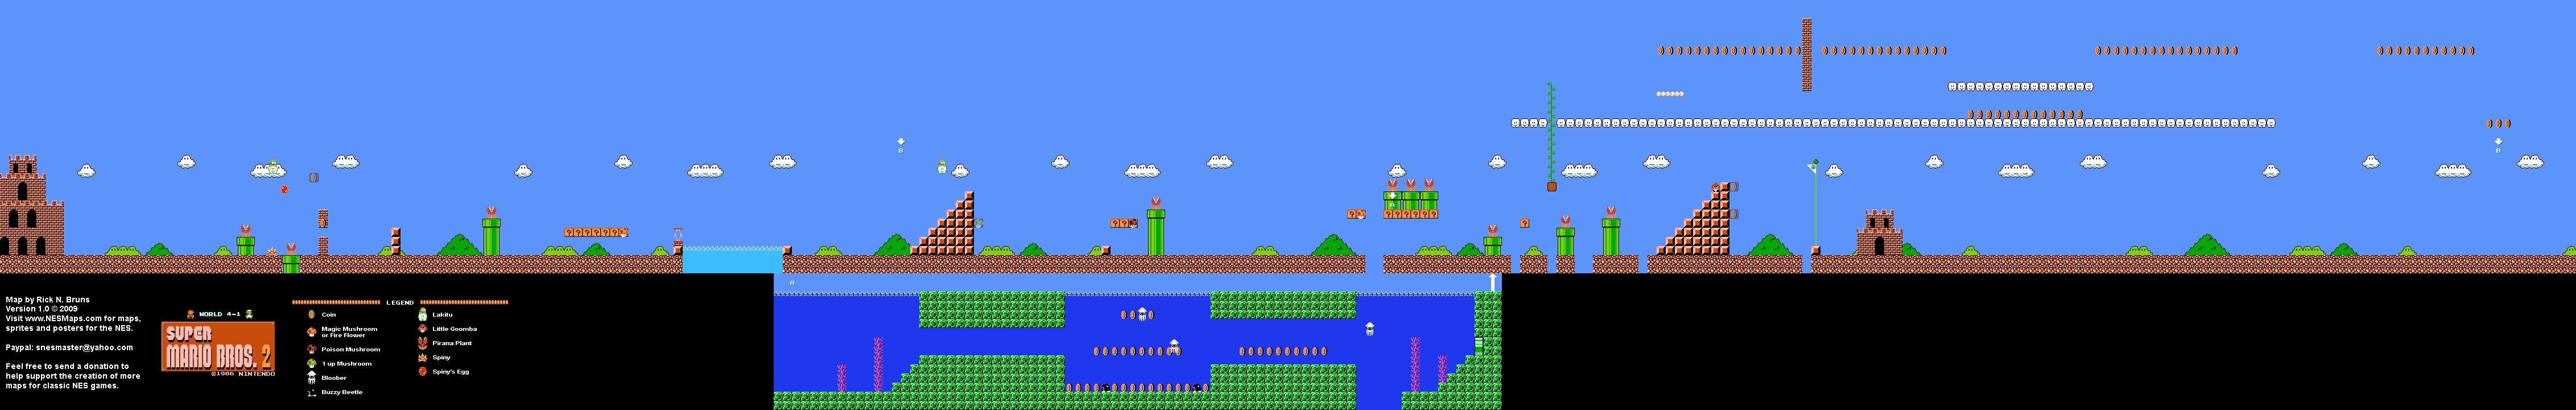 Super Mario Bros 2 Japan The Lost Levels World 4 1 Nintendo